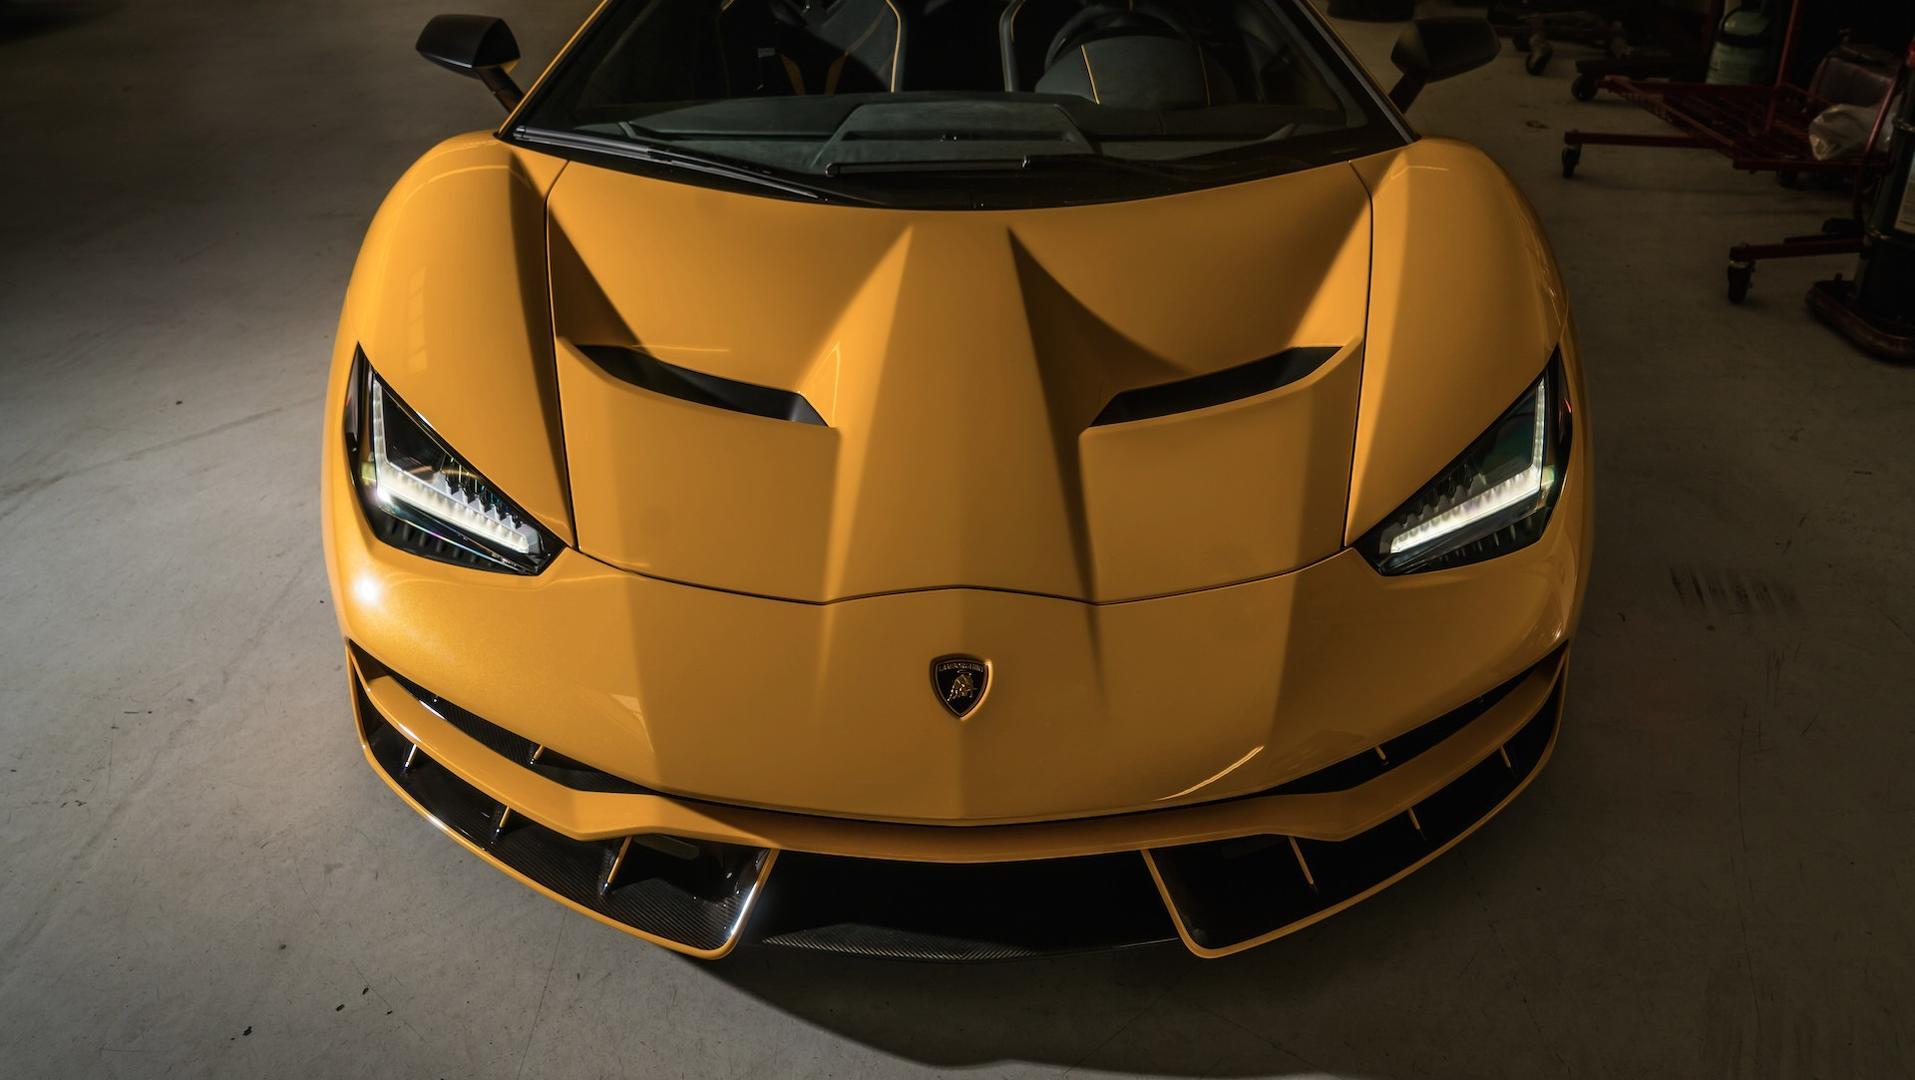 Two New Lamborghini Centenarios Have Landed In The U S